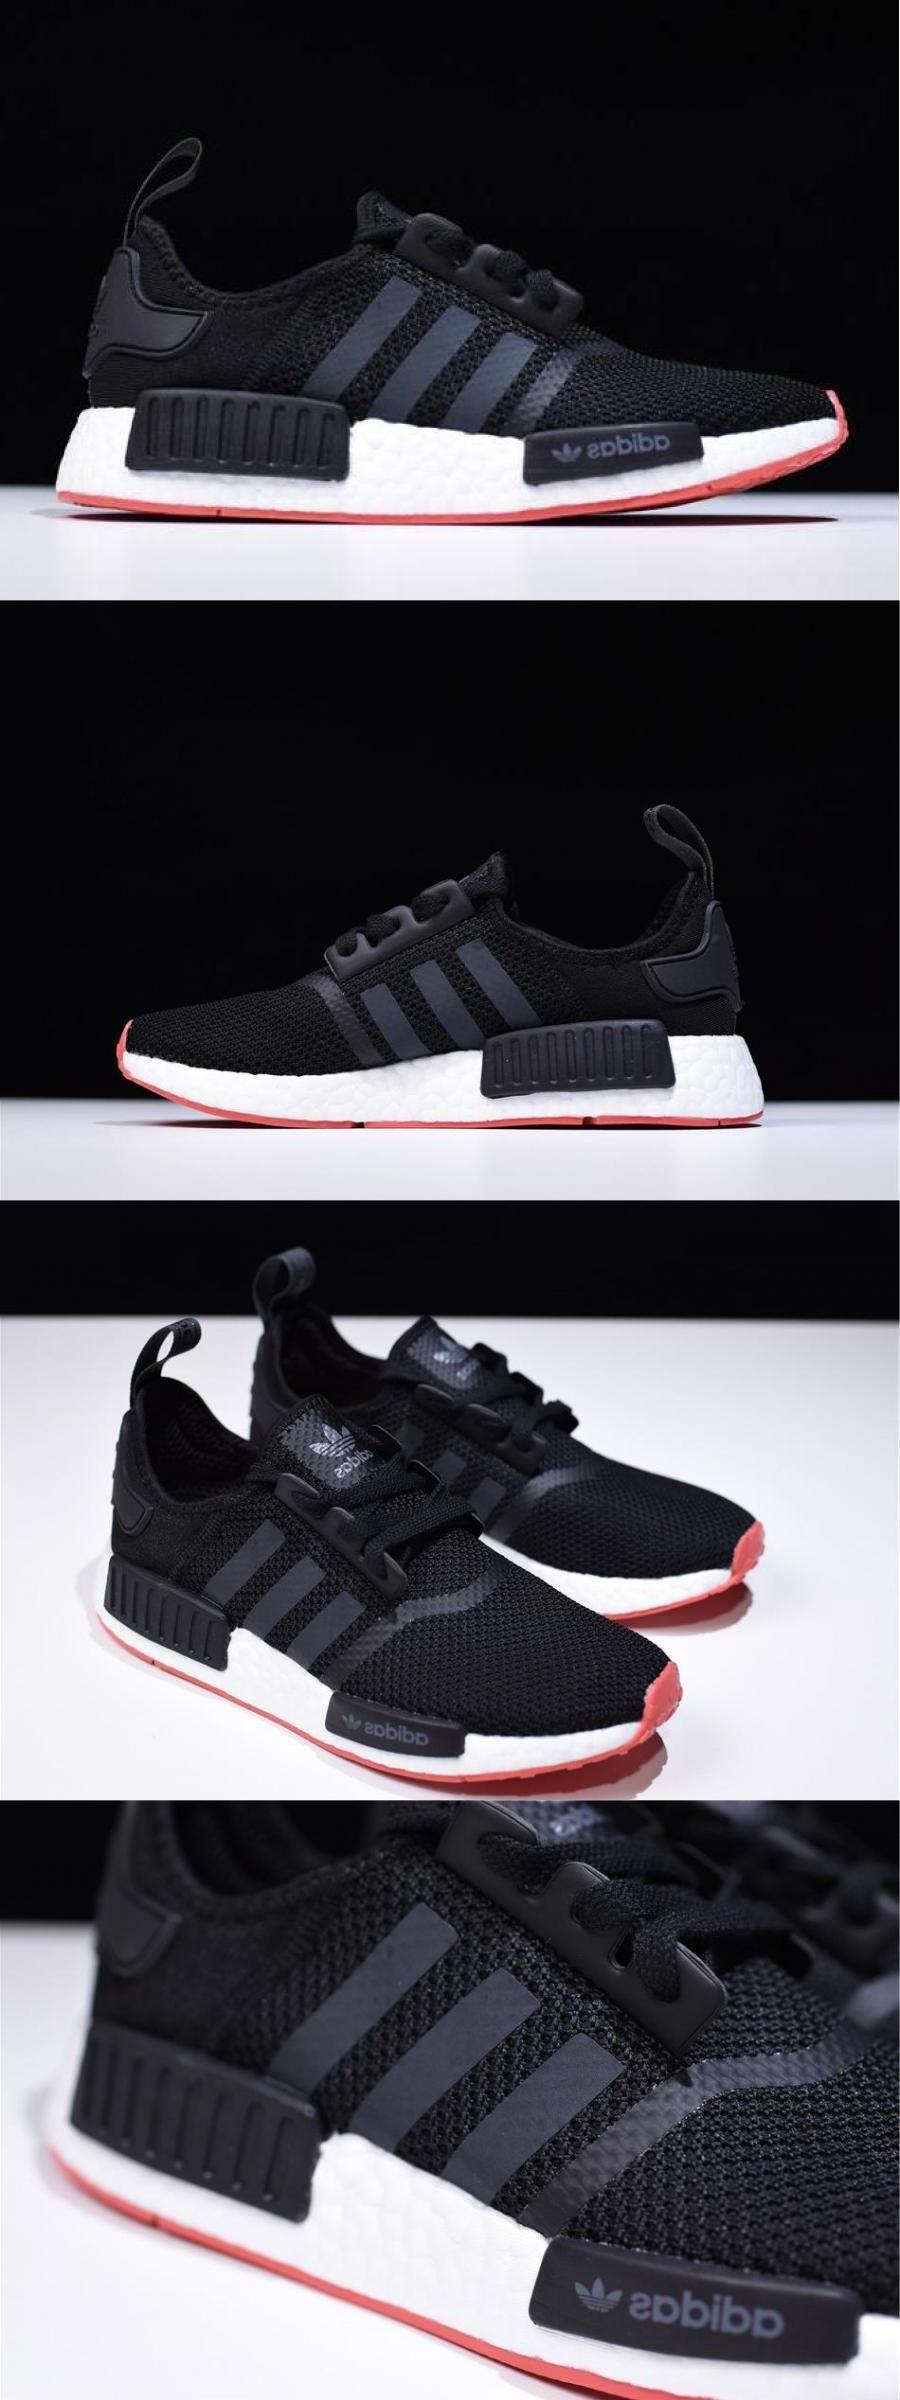 Adidas Nmd R1 Black/carbontrace Scarlet Men's Running